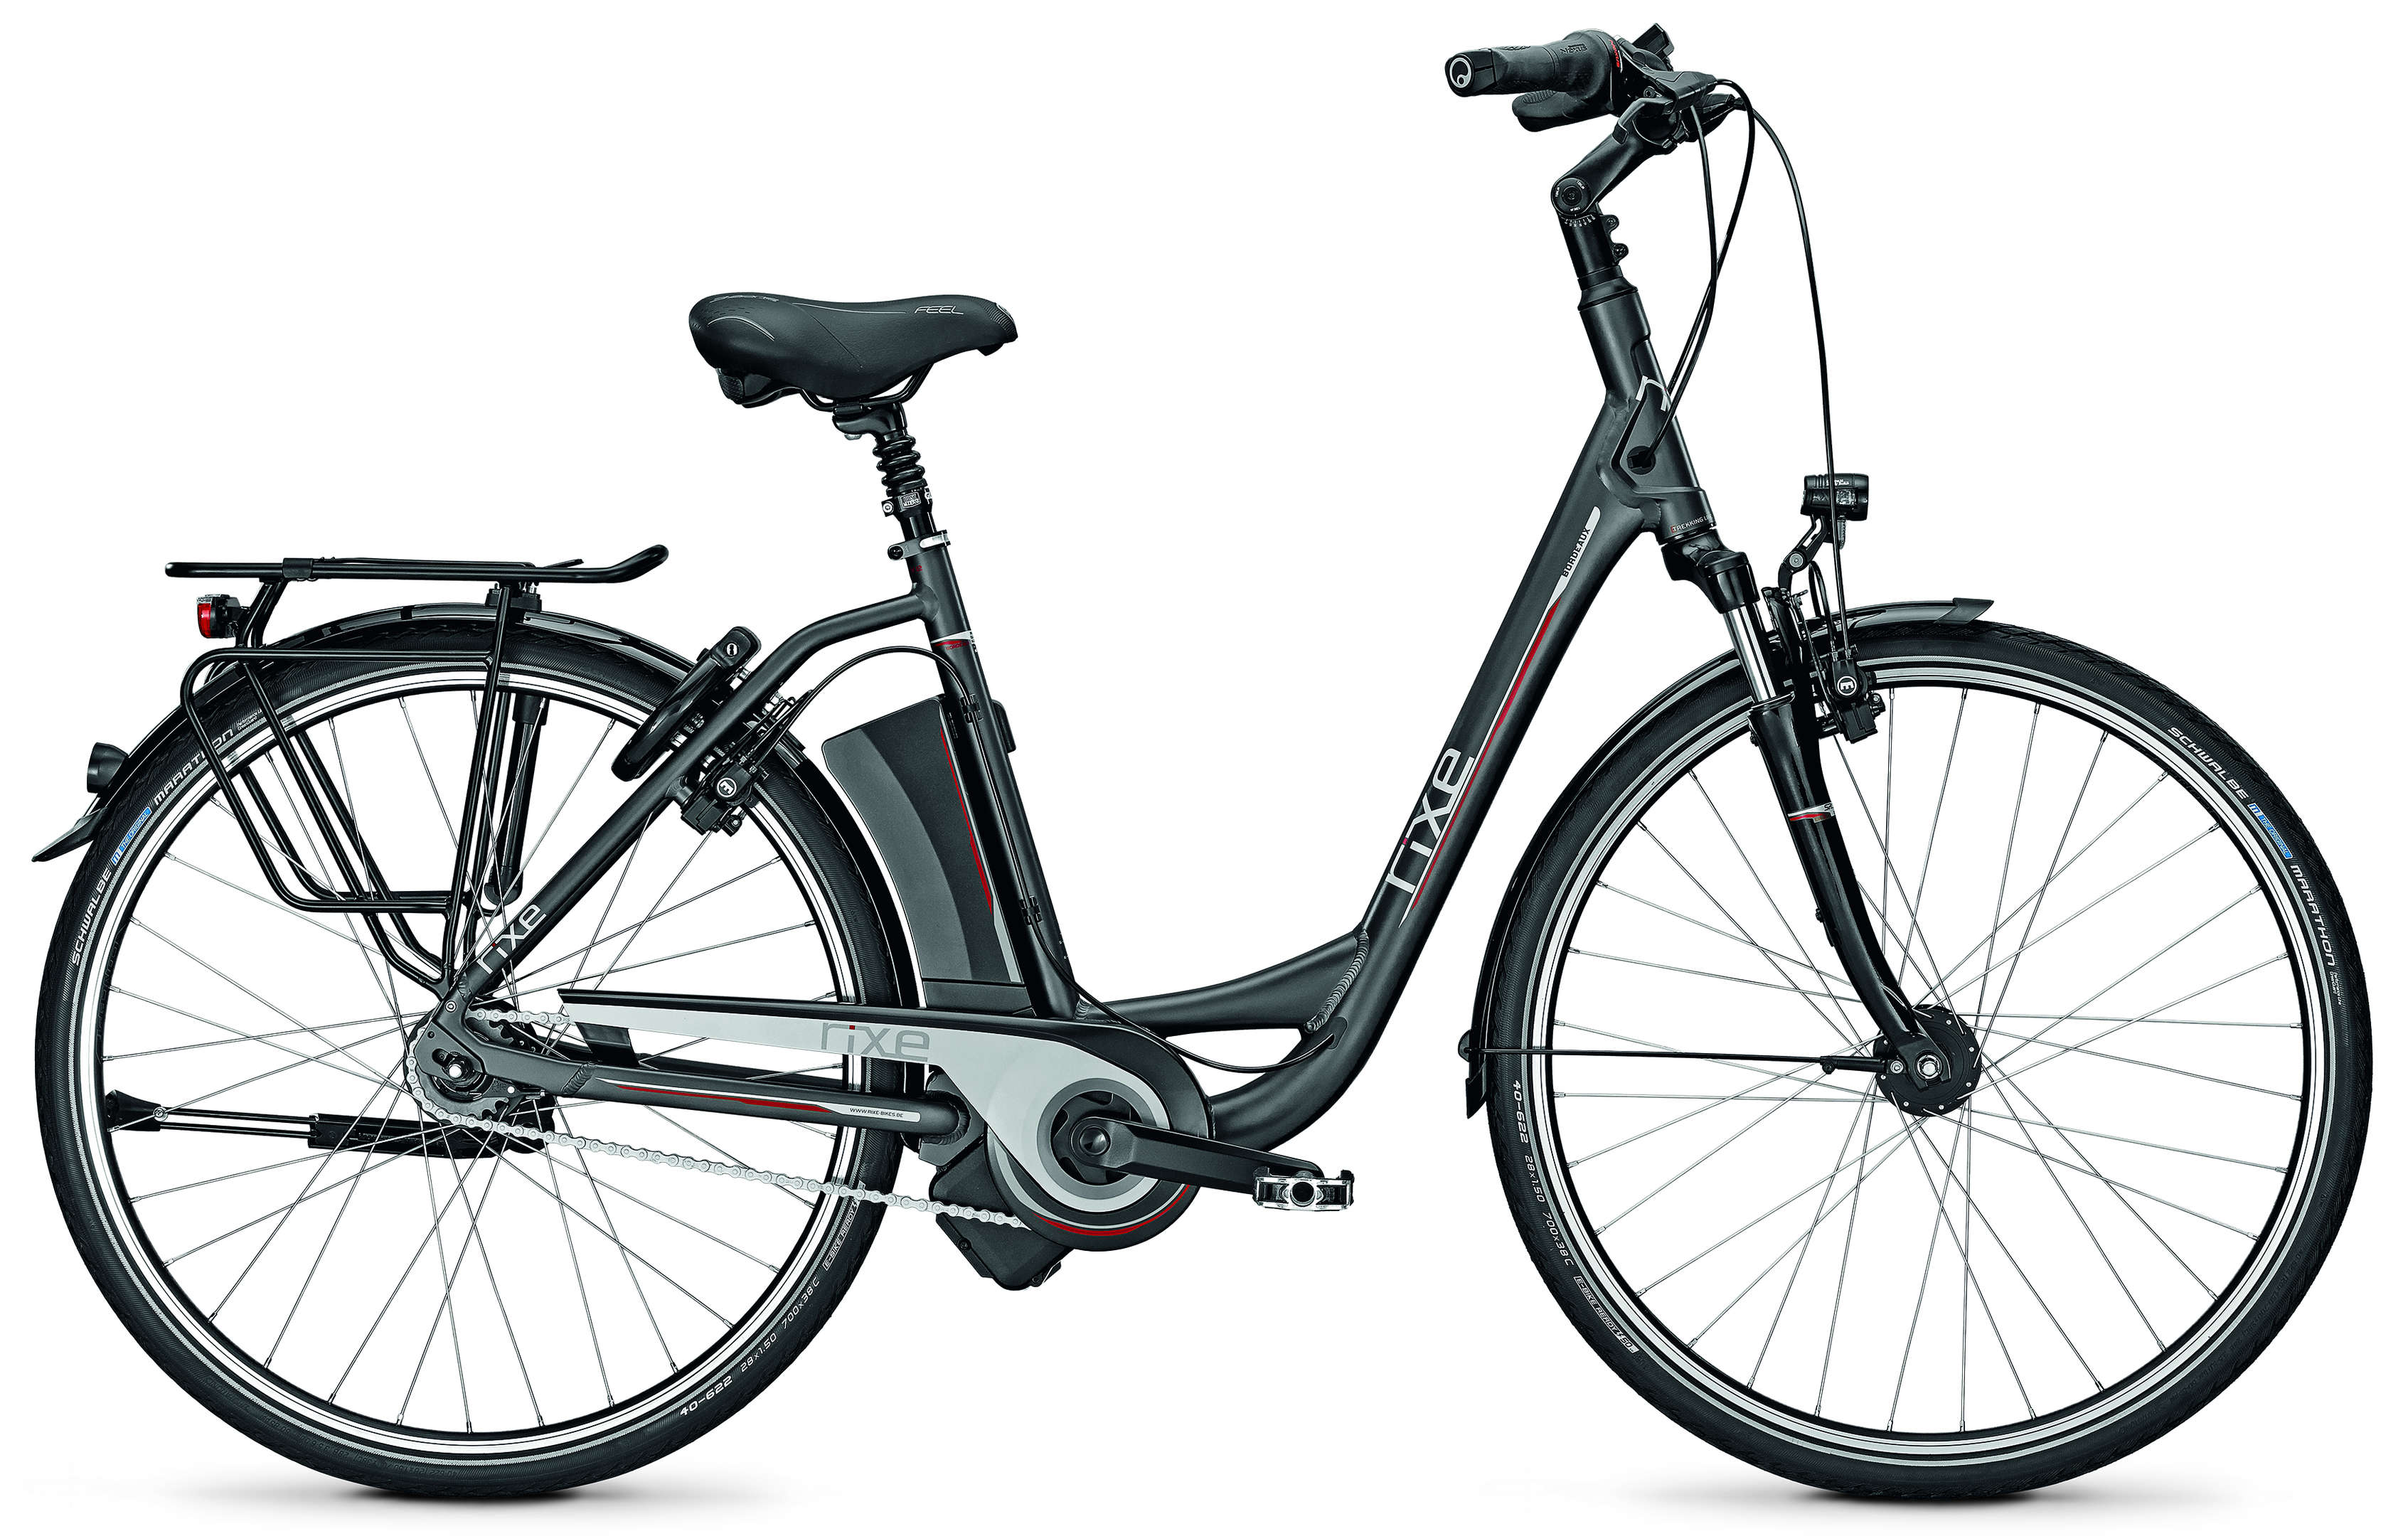 rixe e bike bordeaux i8 hs eurorad bikeleasingeurorad. Black Bedroom Furniture Sets. Home Design Ideas